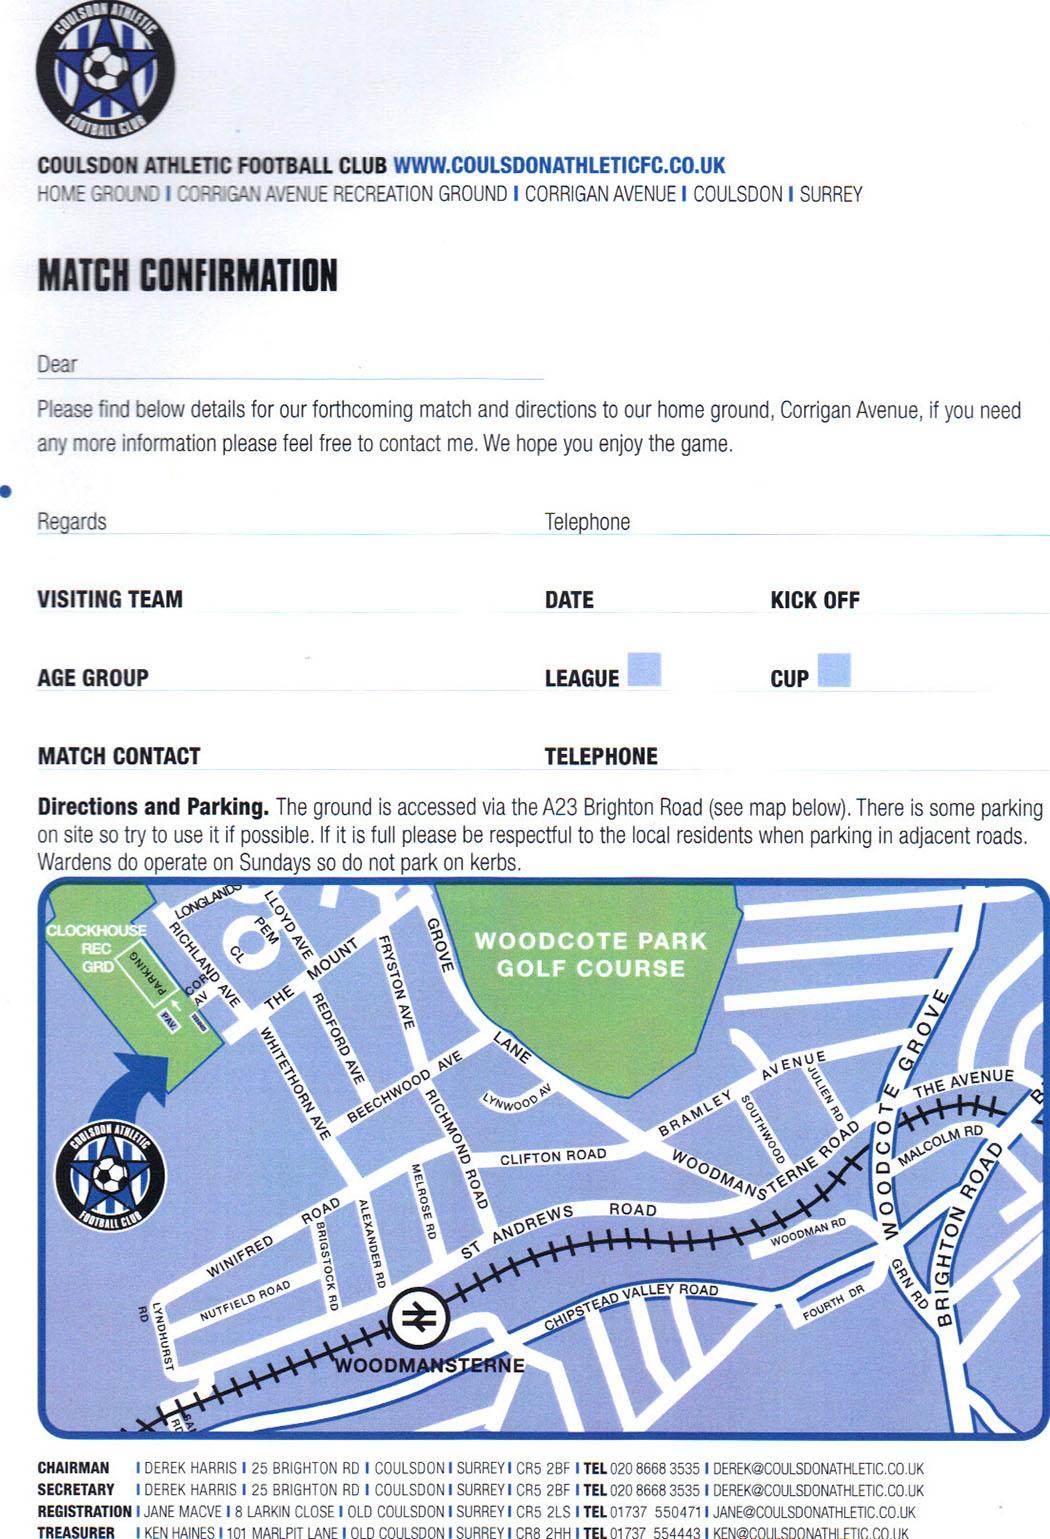 Match confirmation